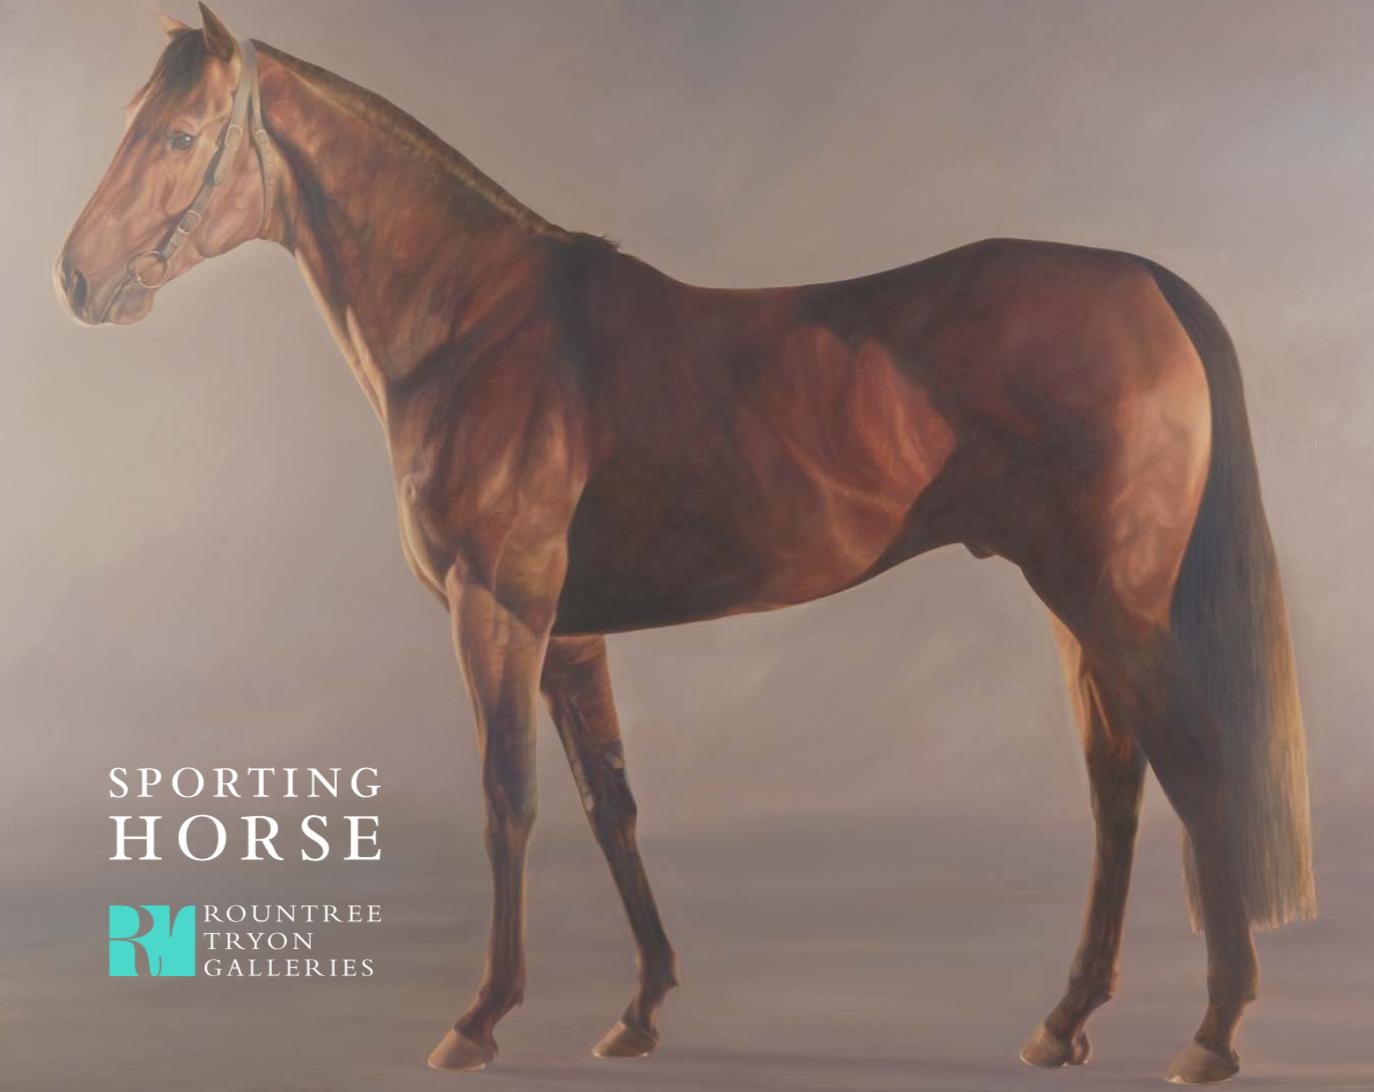 Sporting Horse at Rountree Tryon